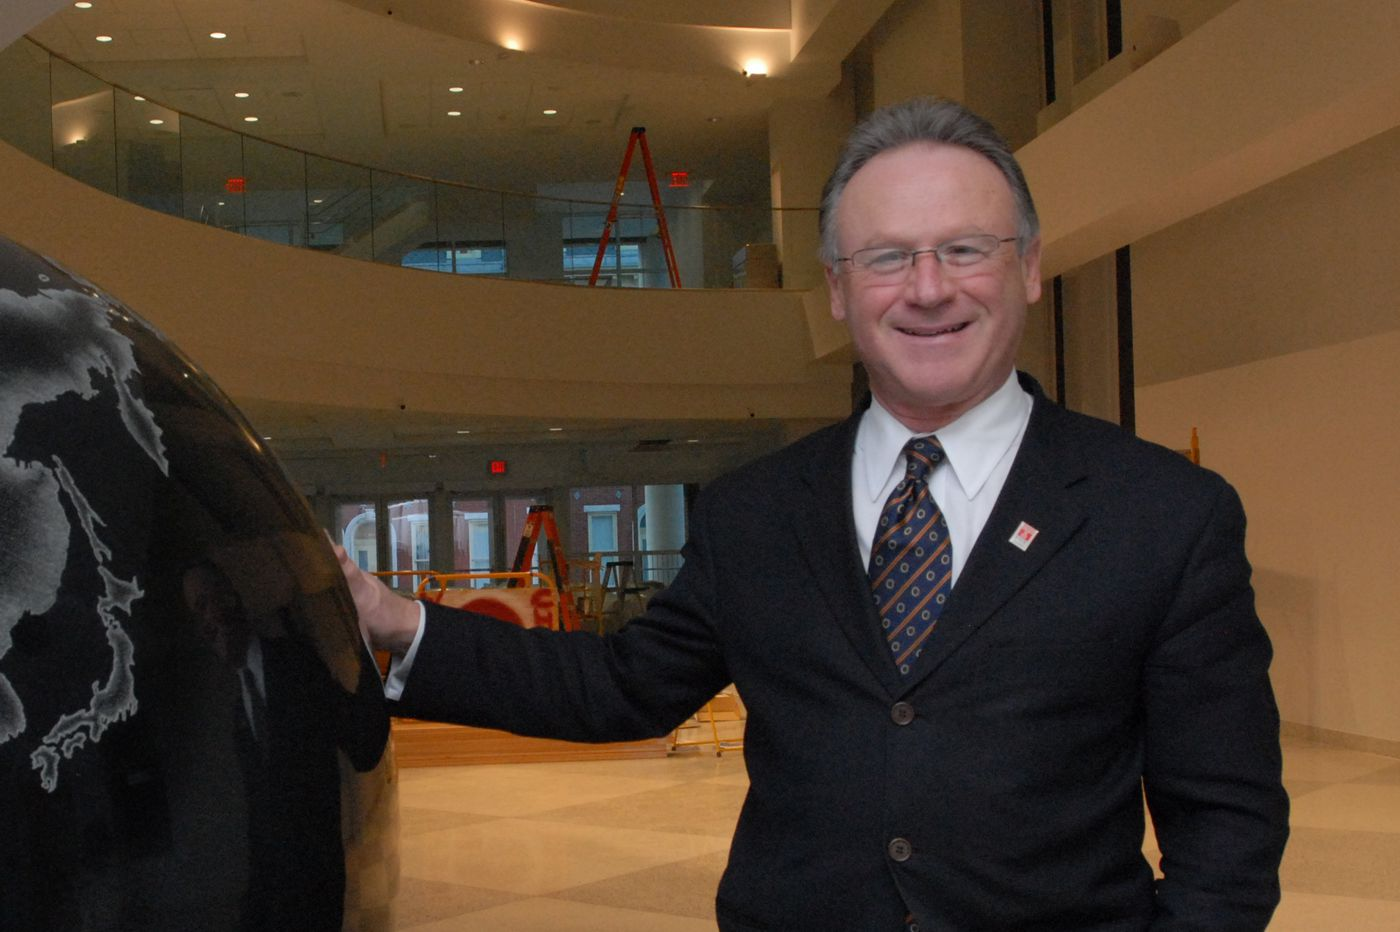 Ousted Temple Fox Business School dean fights back, plans $25 million lawsuit